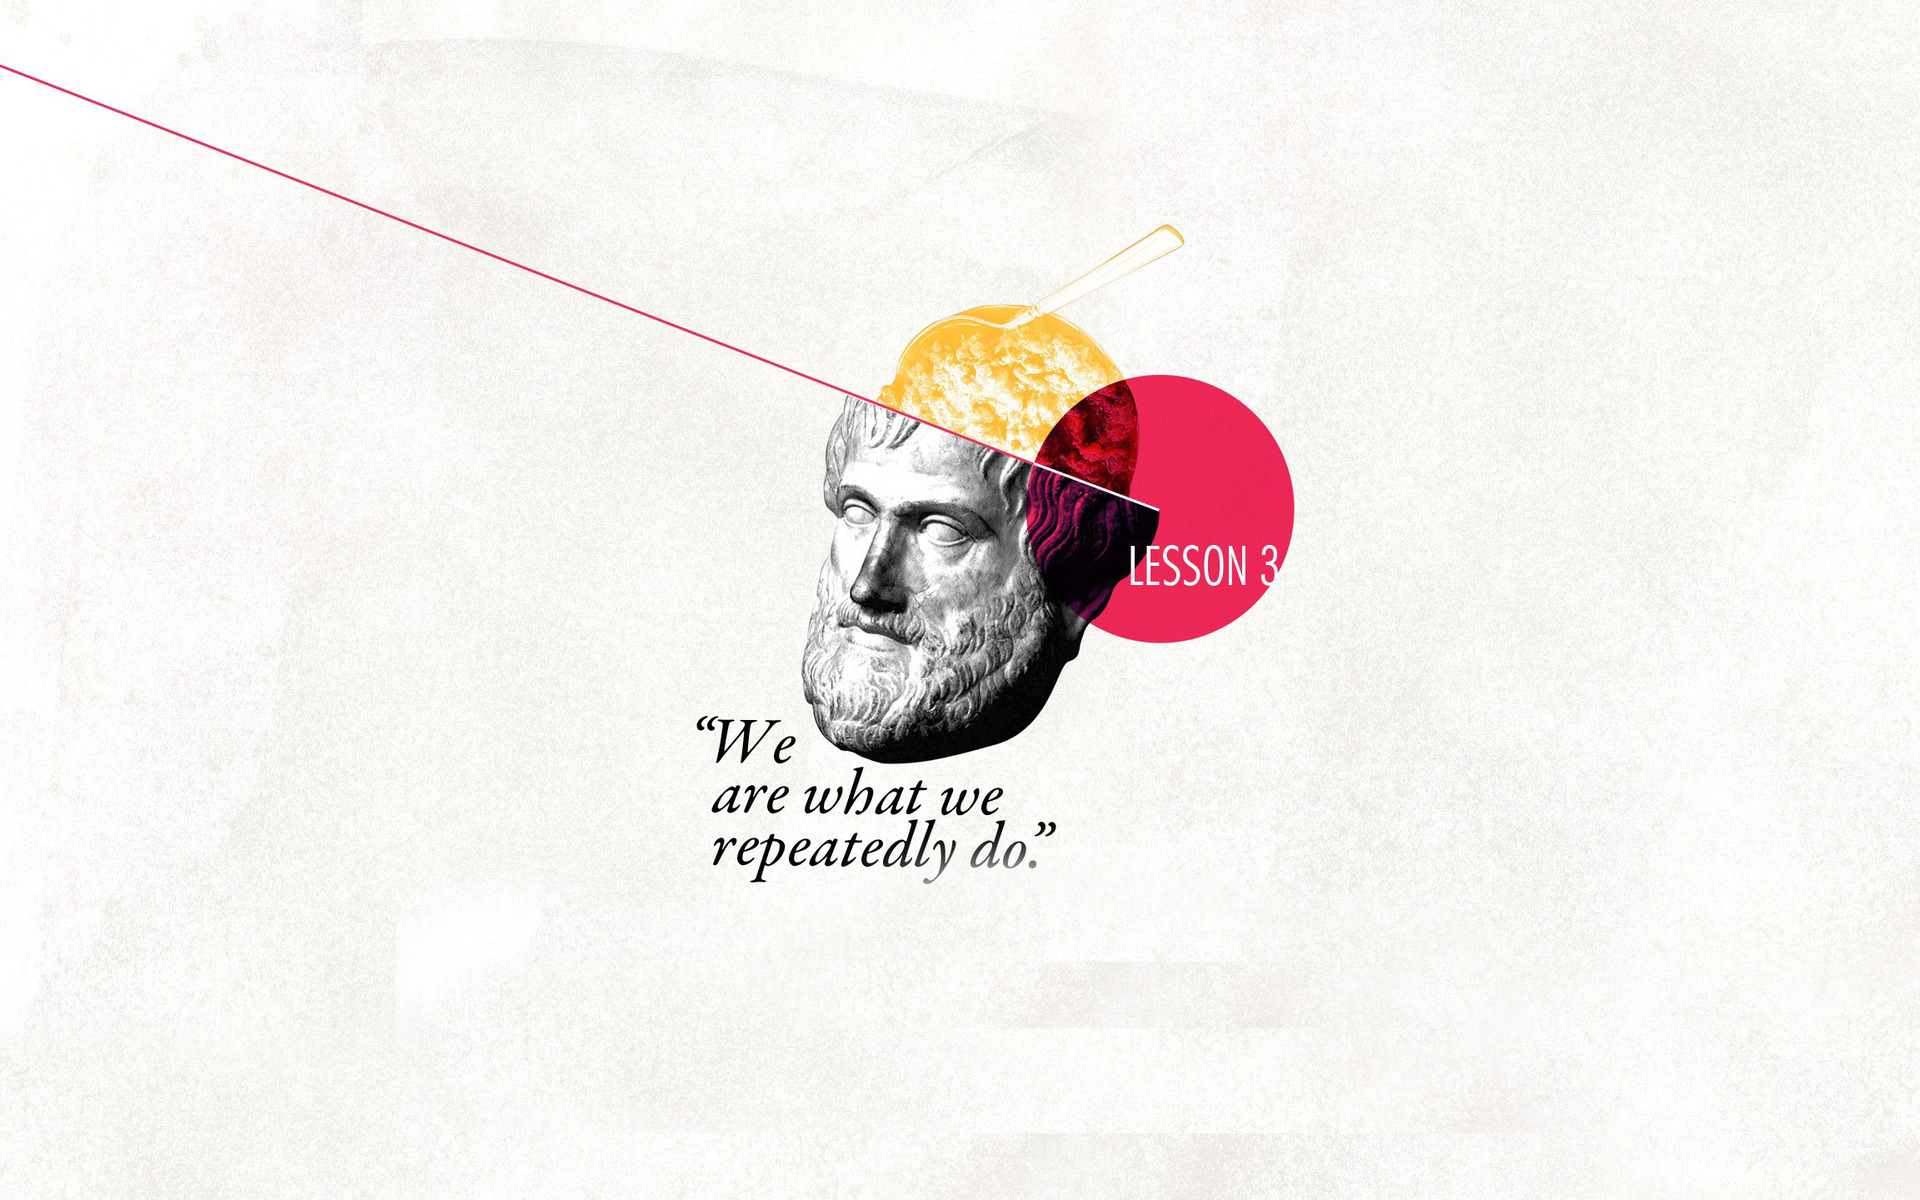 Philosophical quote Wallpaper 8144 1920x1200